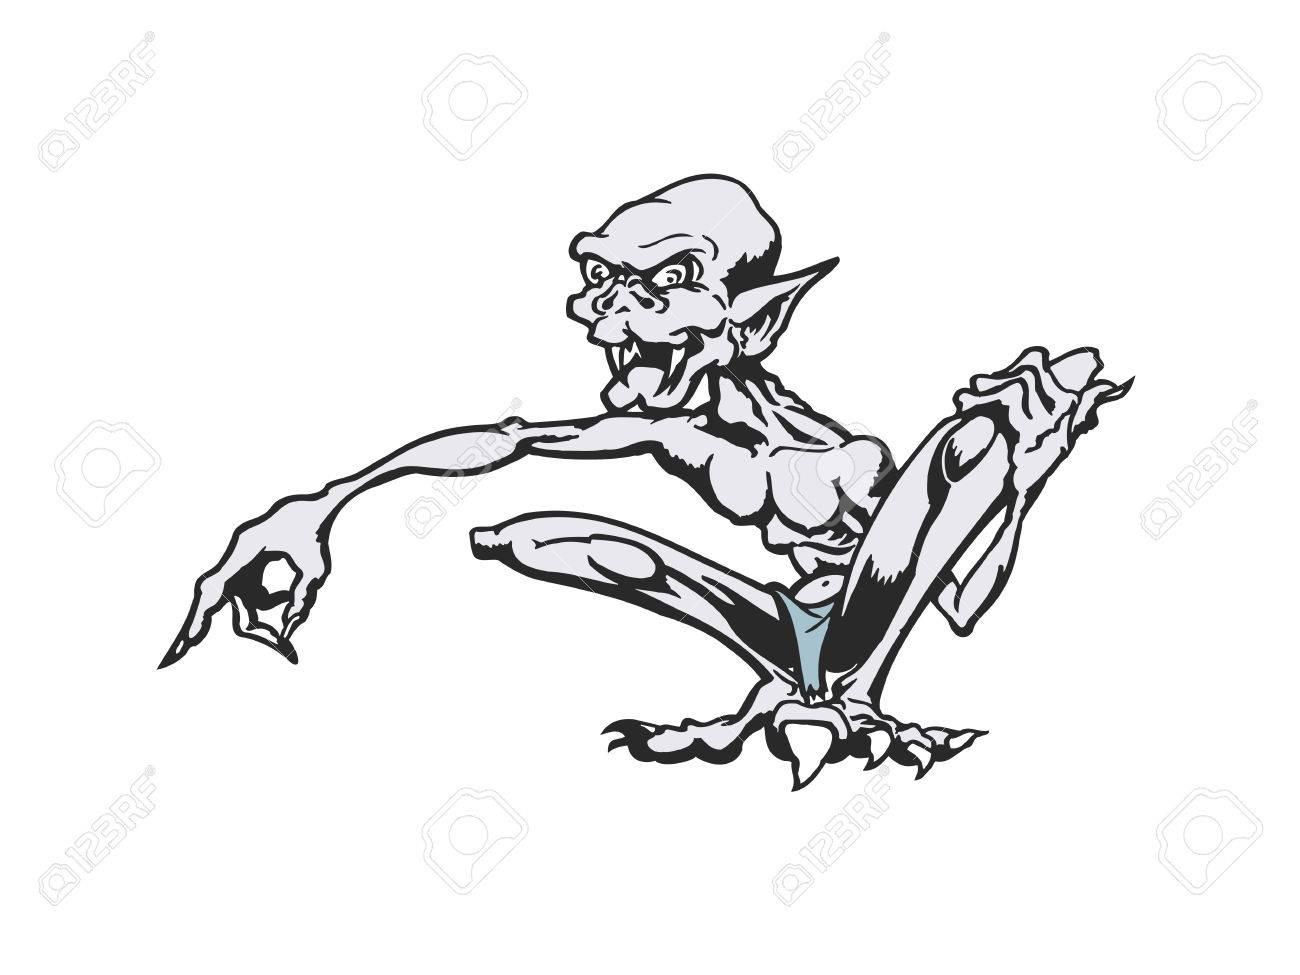 monstruos de dibujos animados flacos personaje de dibujos animados